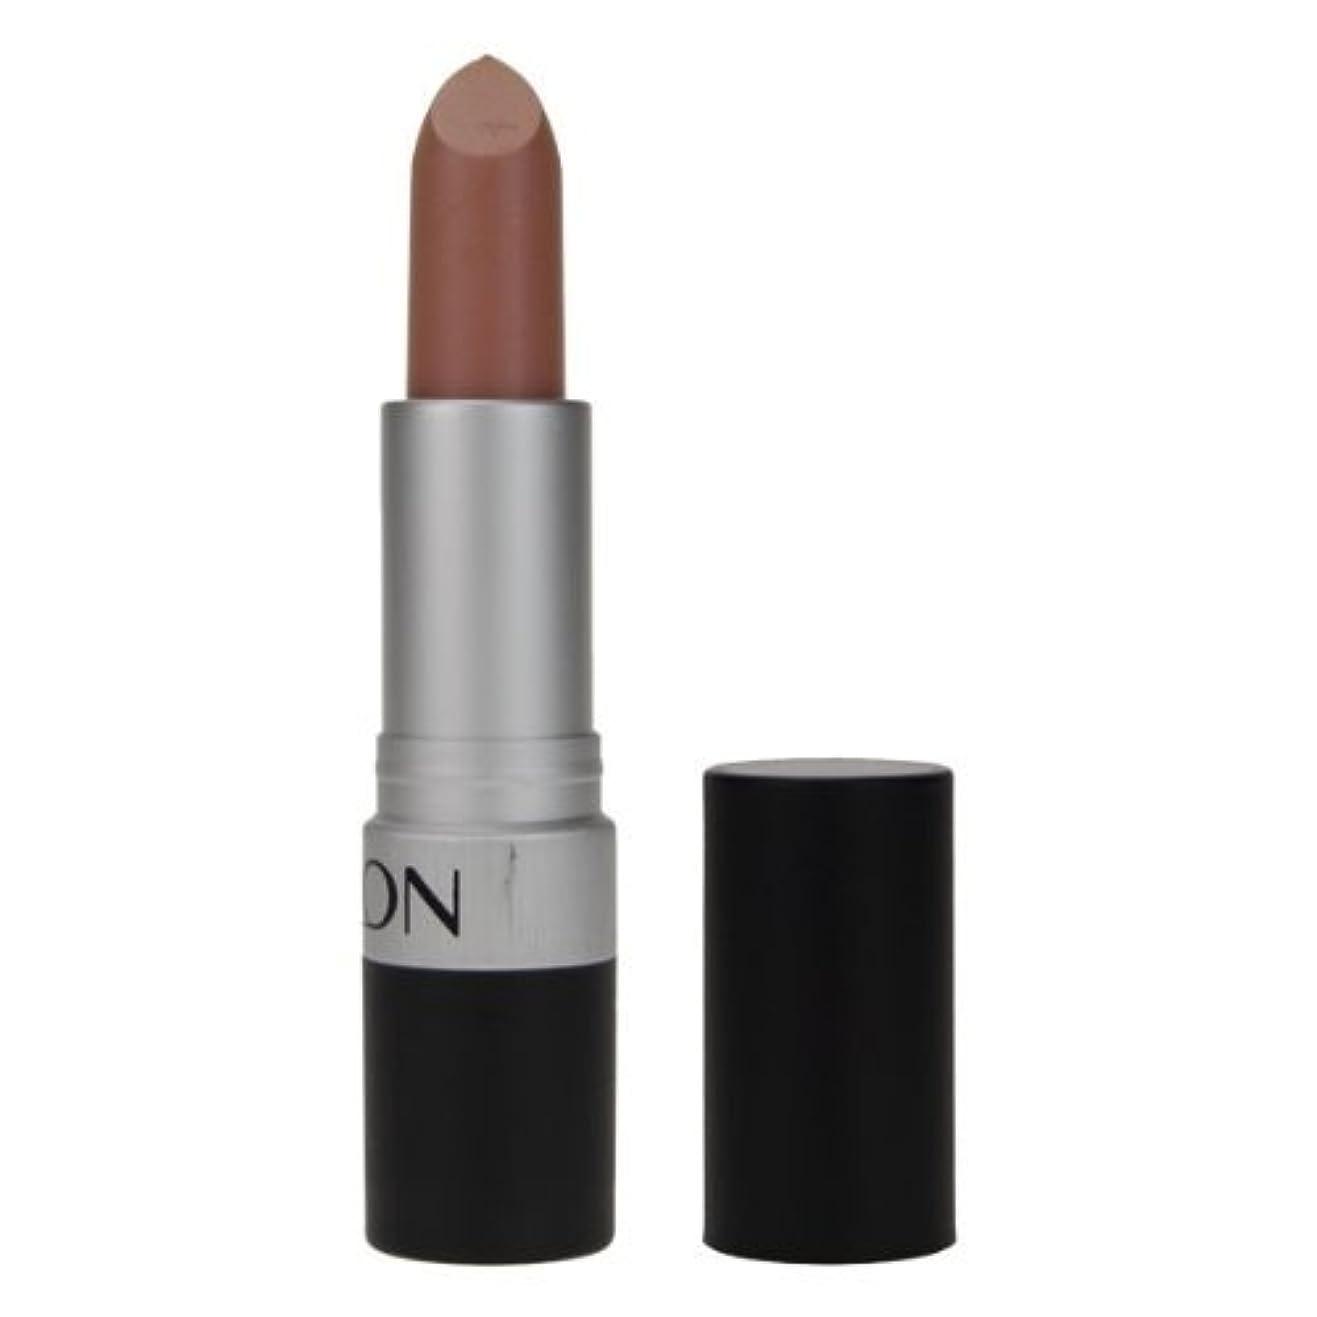 鋼大西洋経済REVLON Super Lustrous Lipstick Matte - Nude Attitude 001 (並行輸入品)